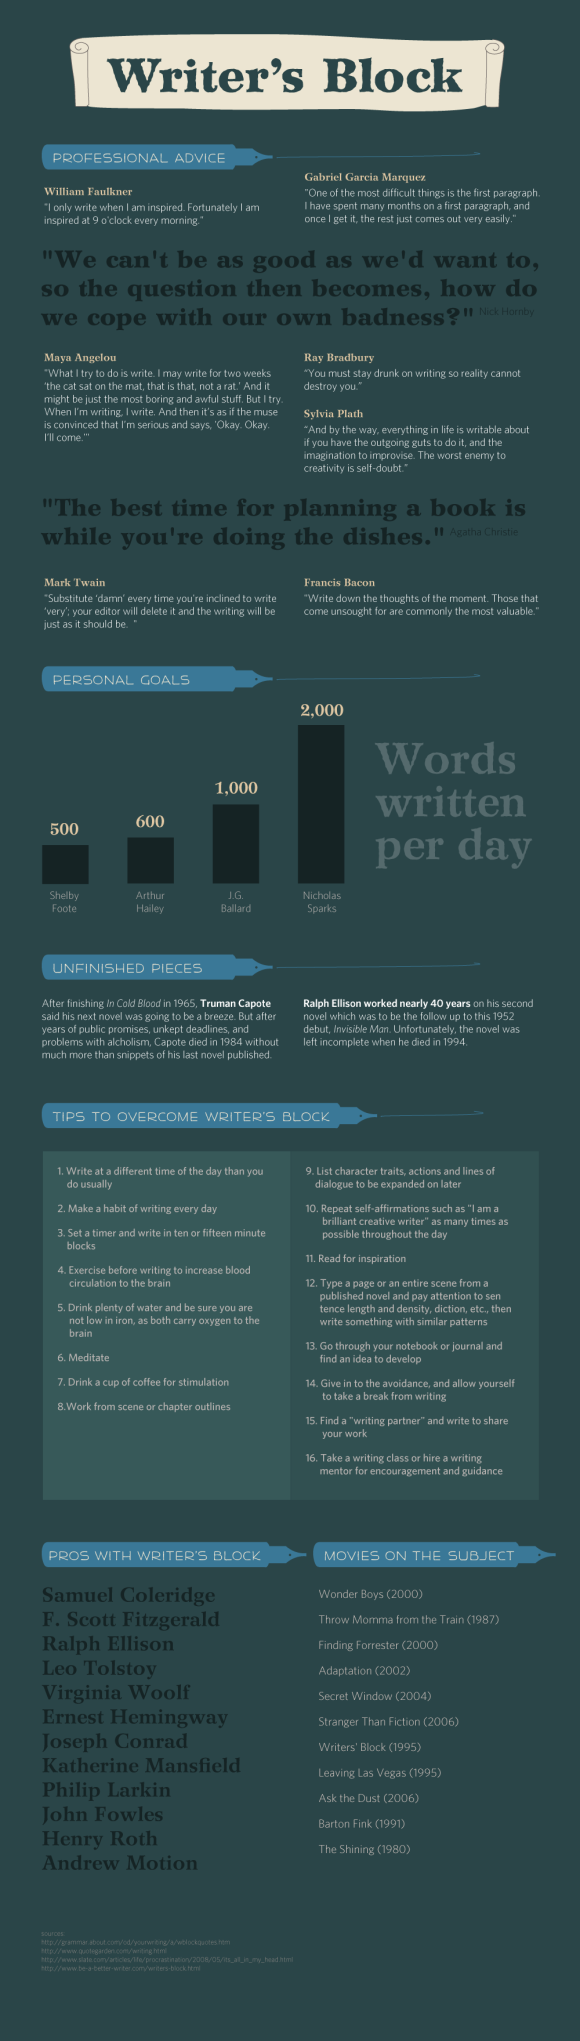 Urban Dictionary: writer's block